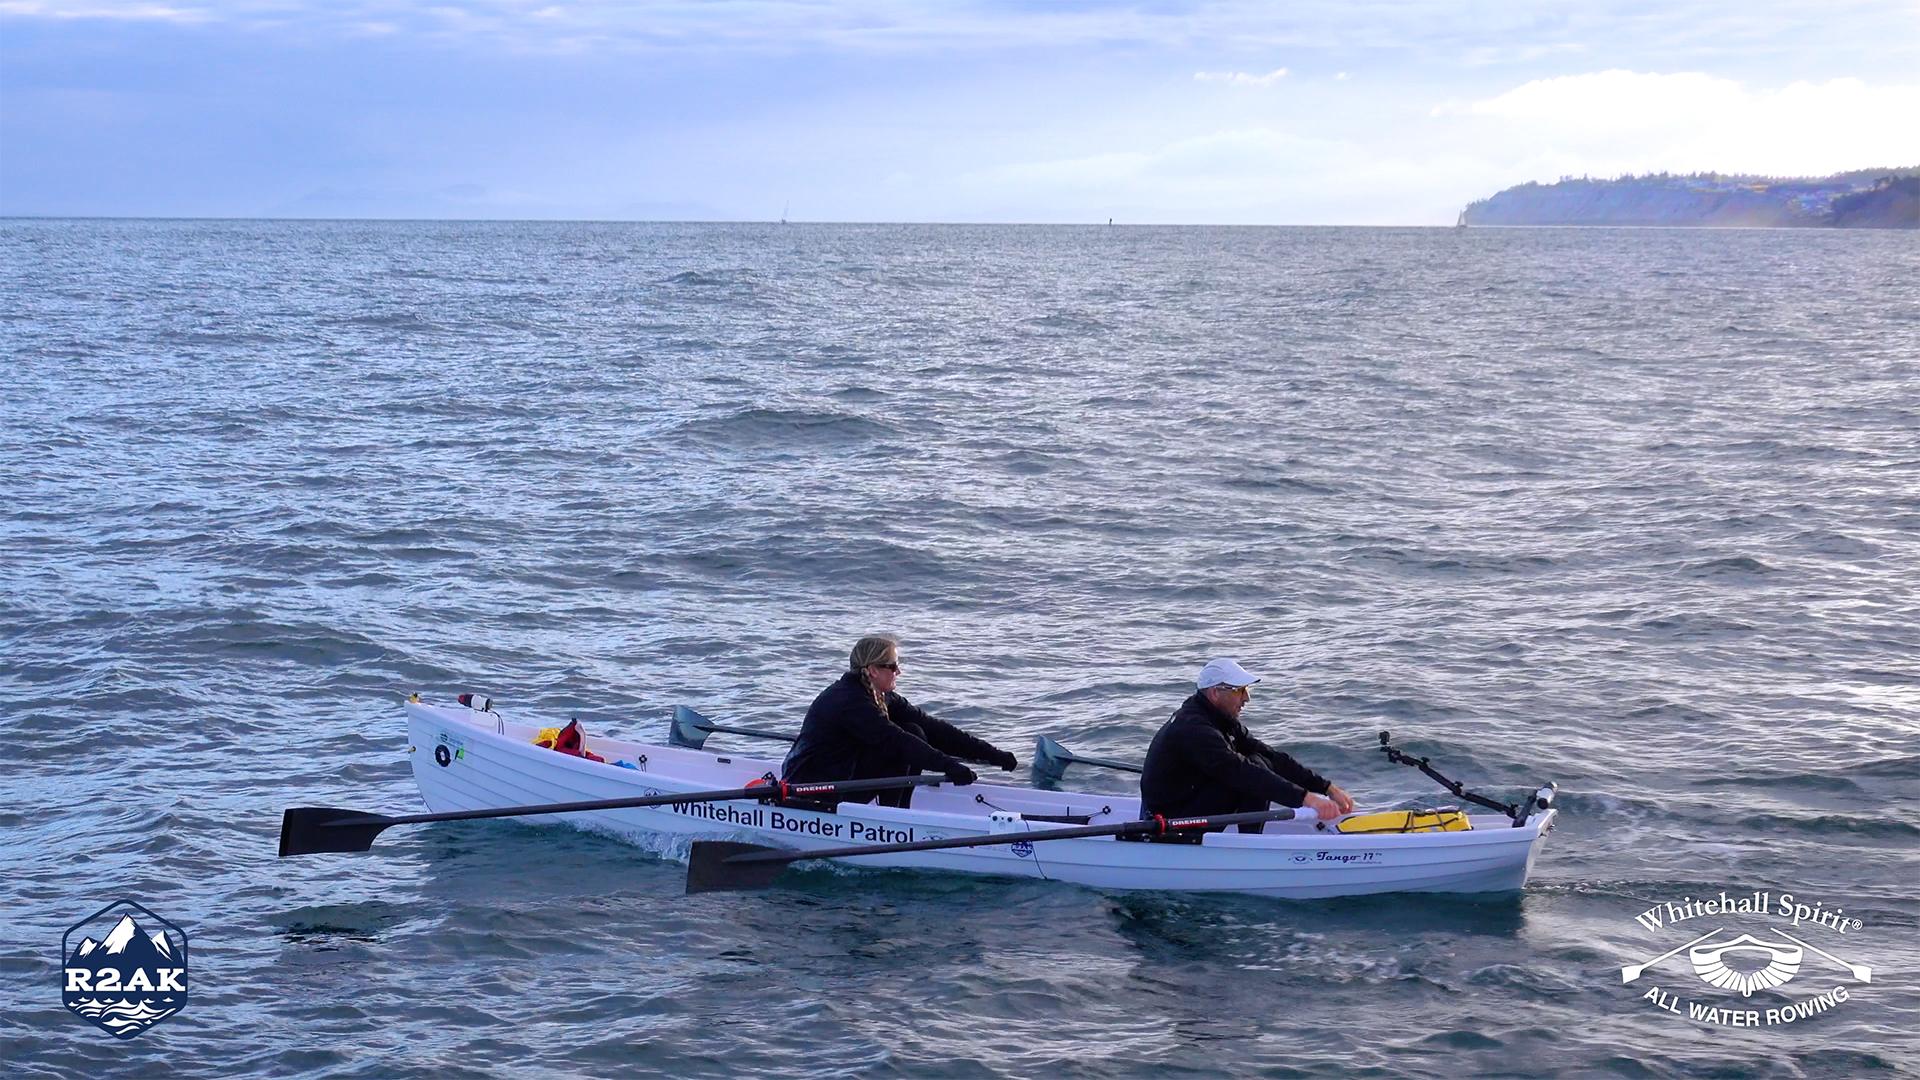 Race-to-Alaska-R2AK-Diana Lesieur-Peter-Vogel-Whitehall-Rowing